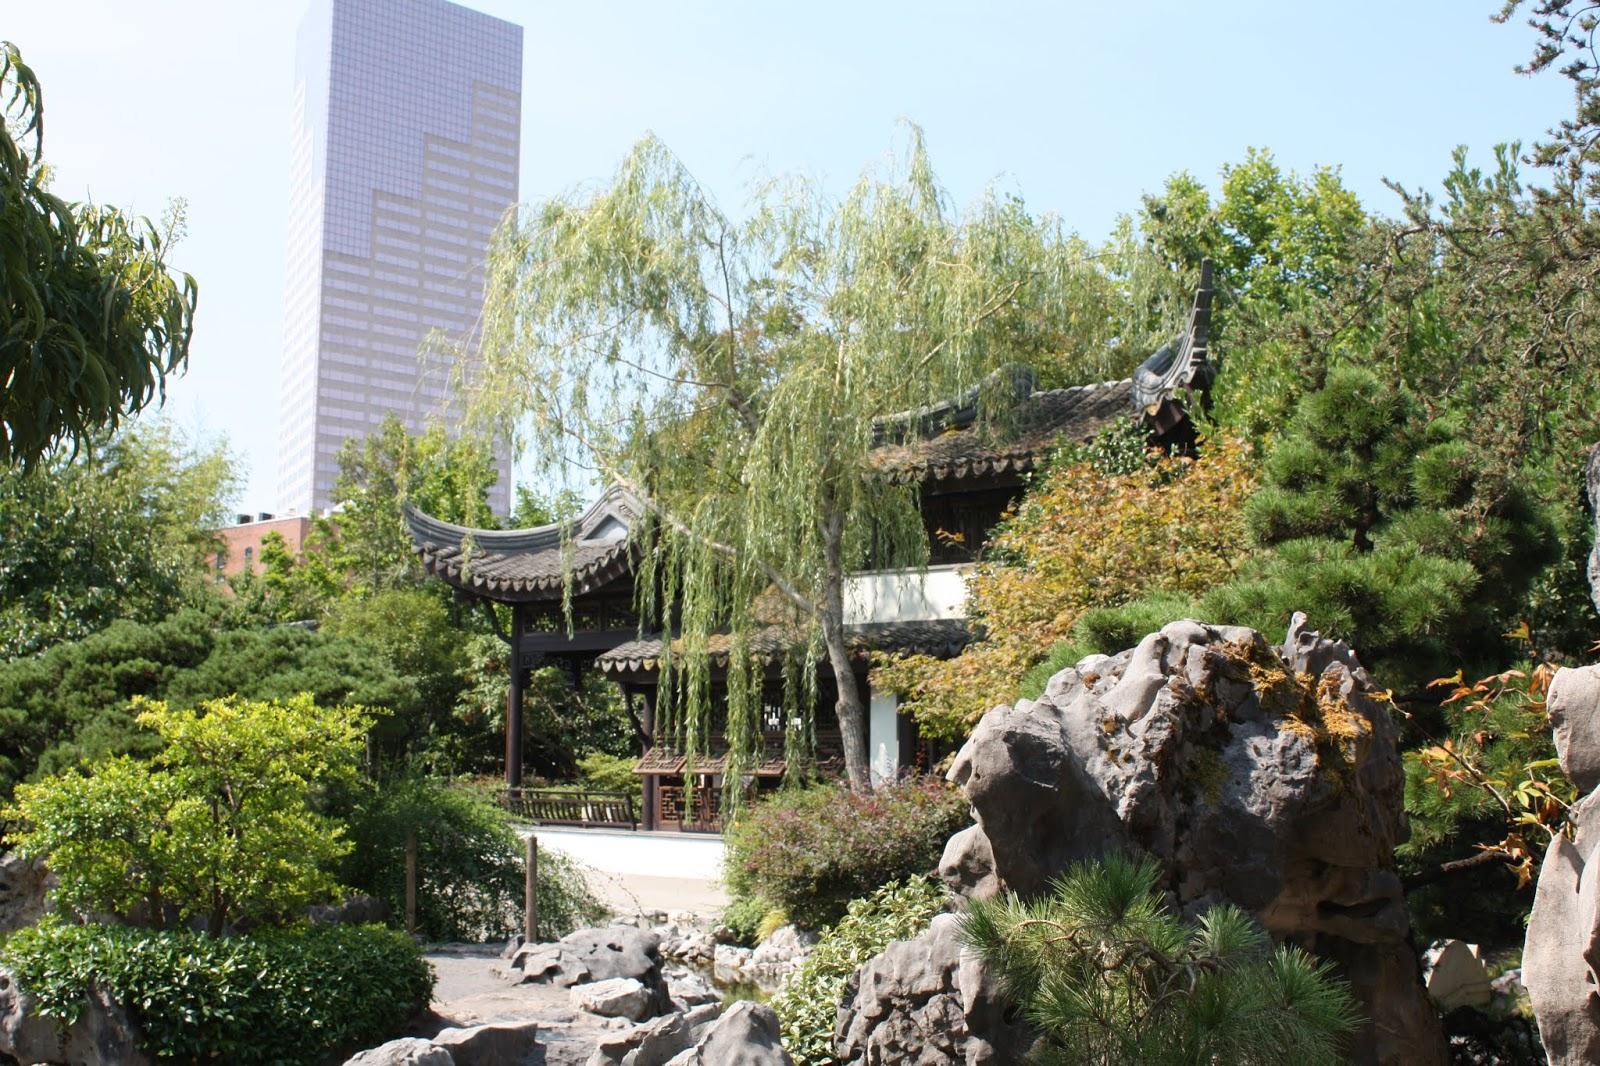 lan su chinese garden in portland oregon - Lan Su Chinese Garden